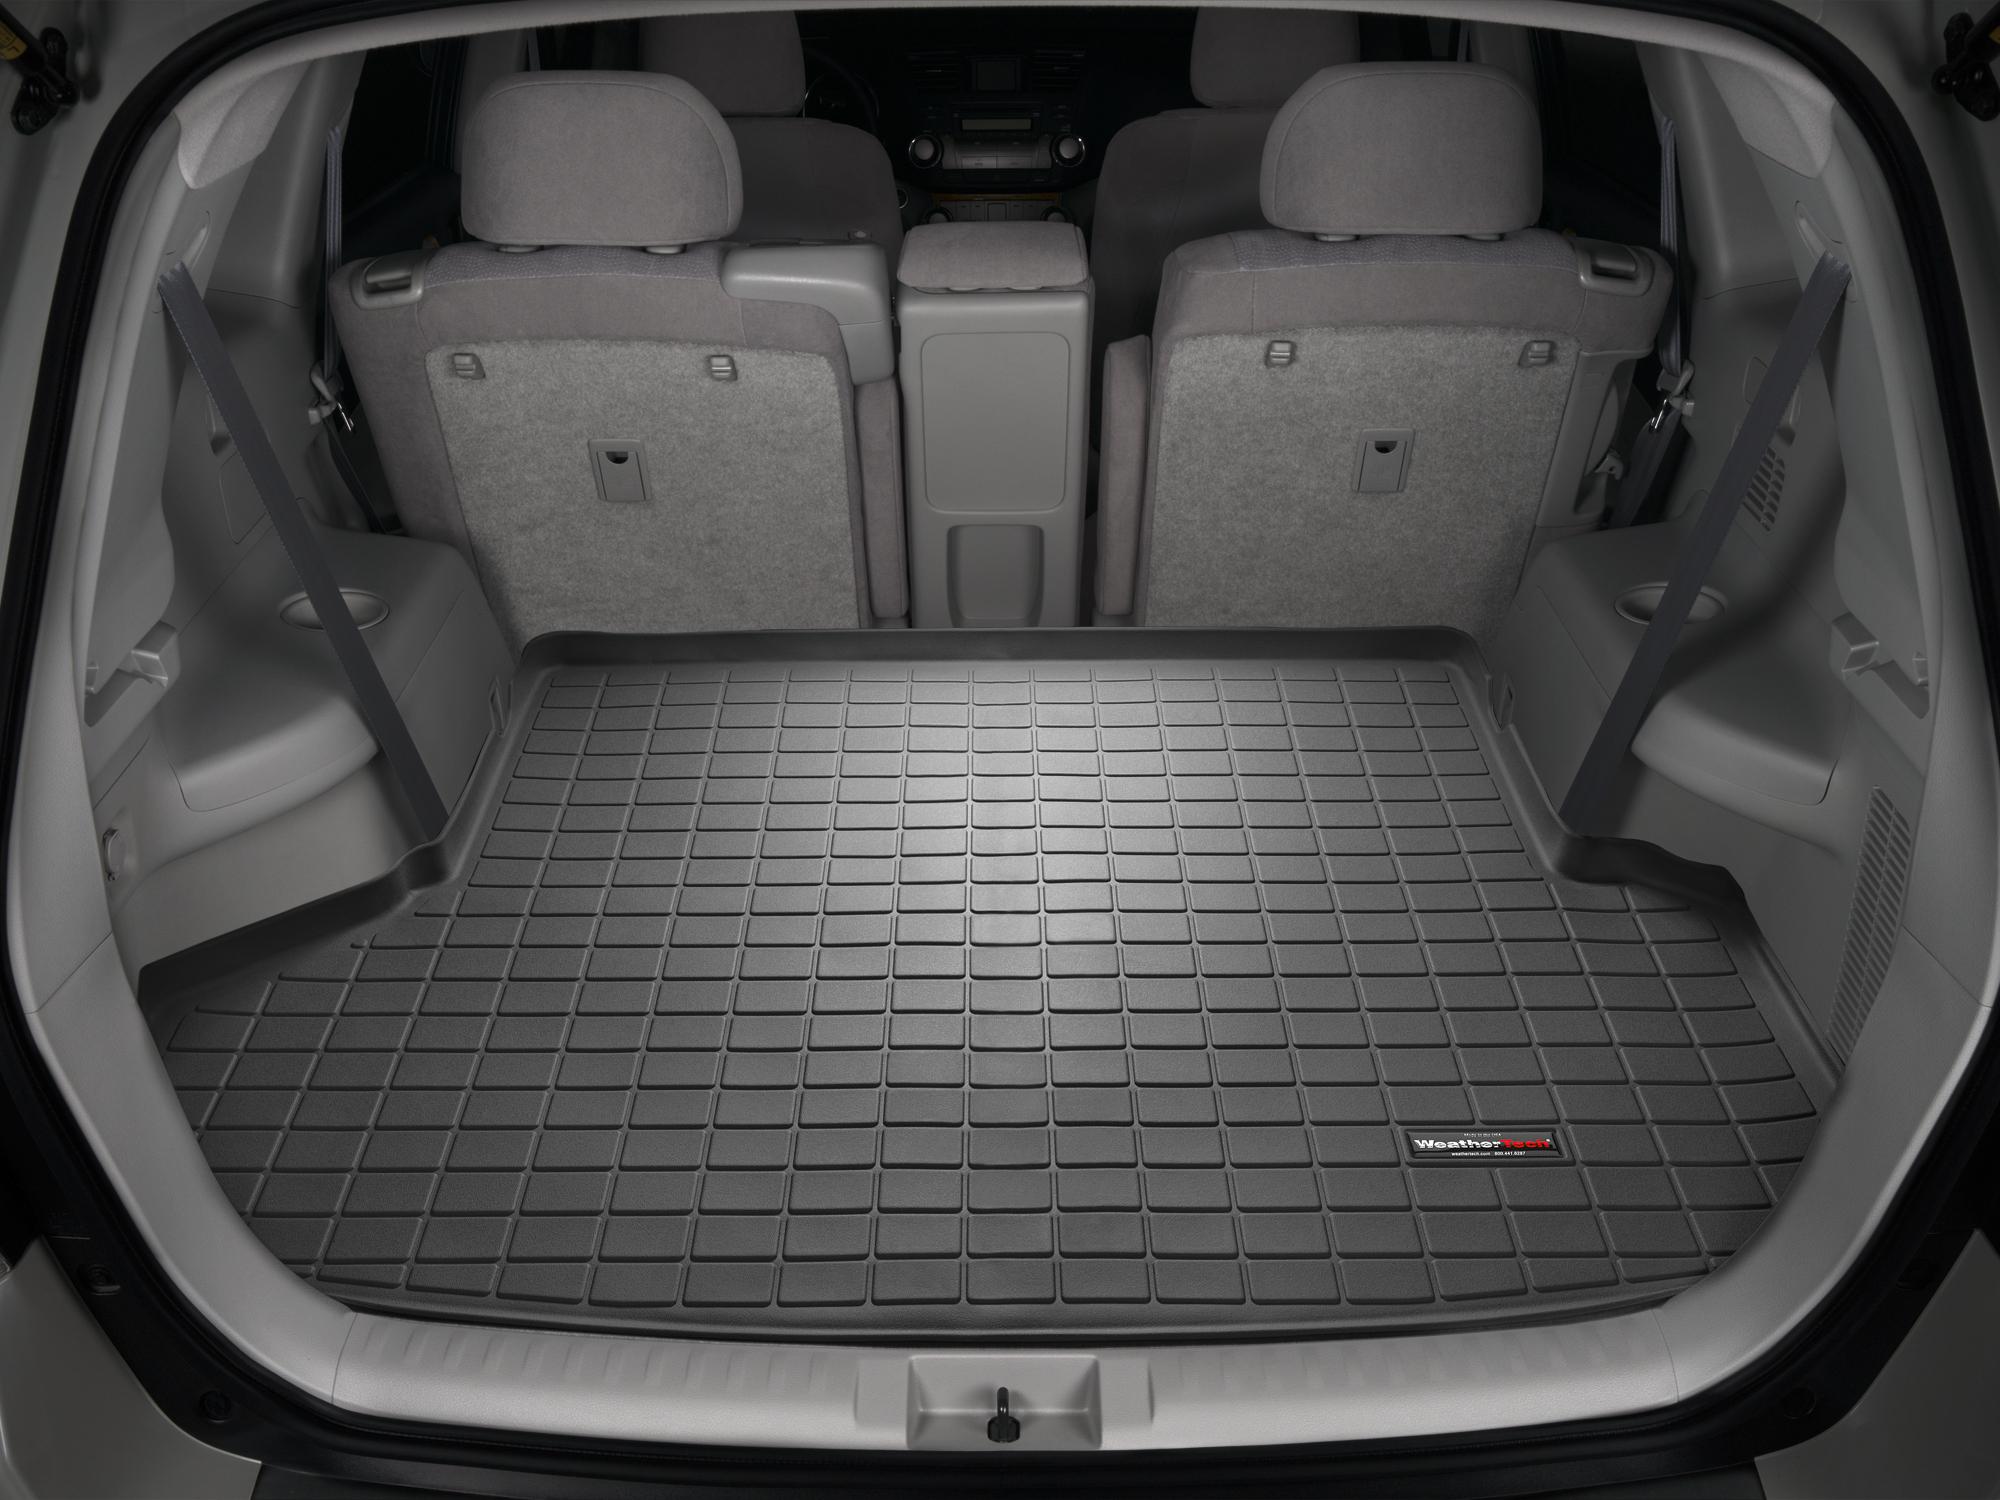 Toyota Highlander 2011>2013 Vasca baule WeatherTech bagagliaio nero *1226*